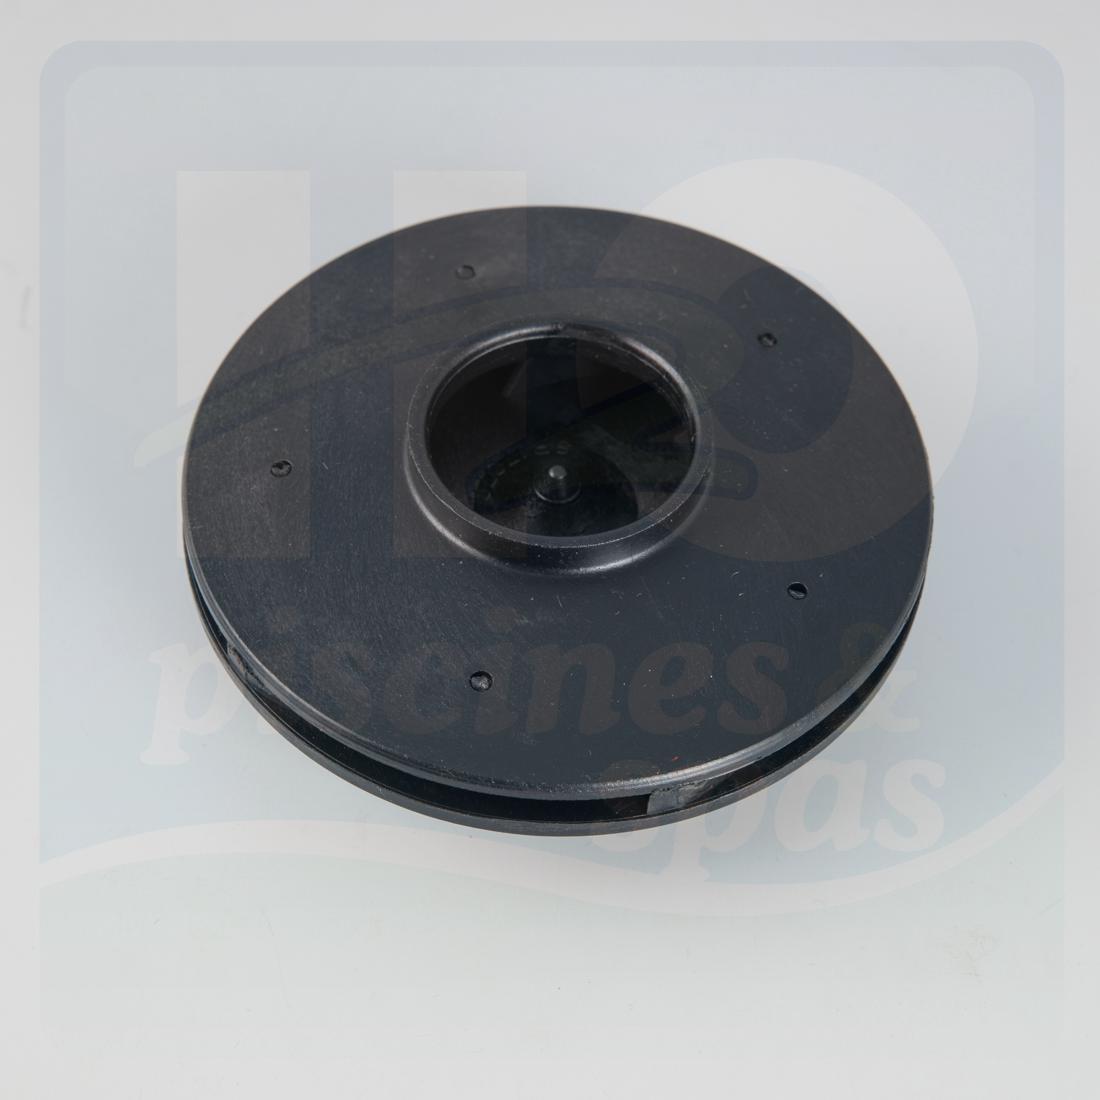 turbine de pompe hayward power flo 3 4 cv h2o piscines spas. Black Bedroom Furniture Sets. Home Design Ideas